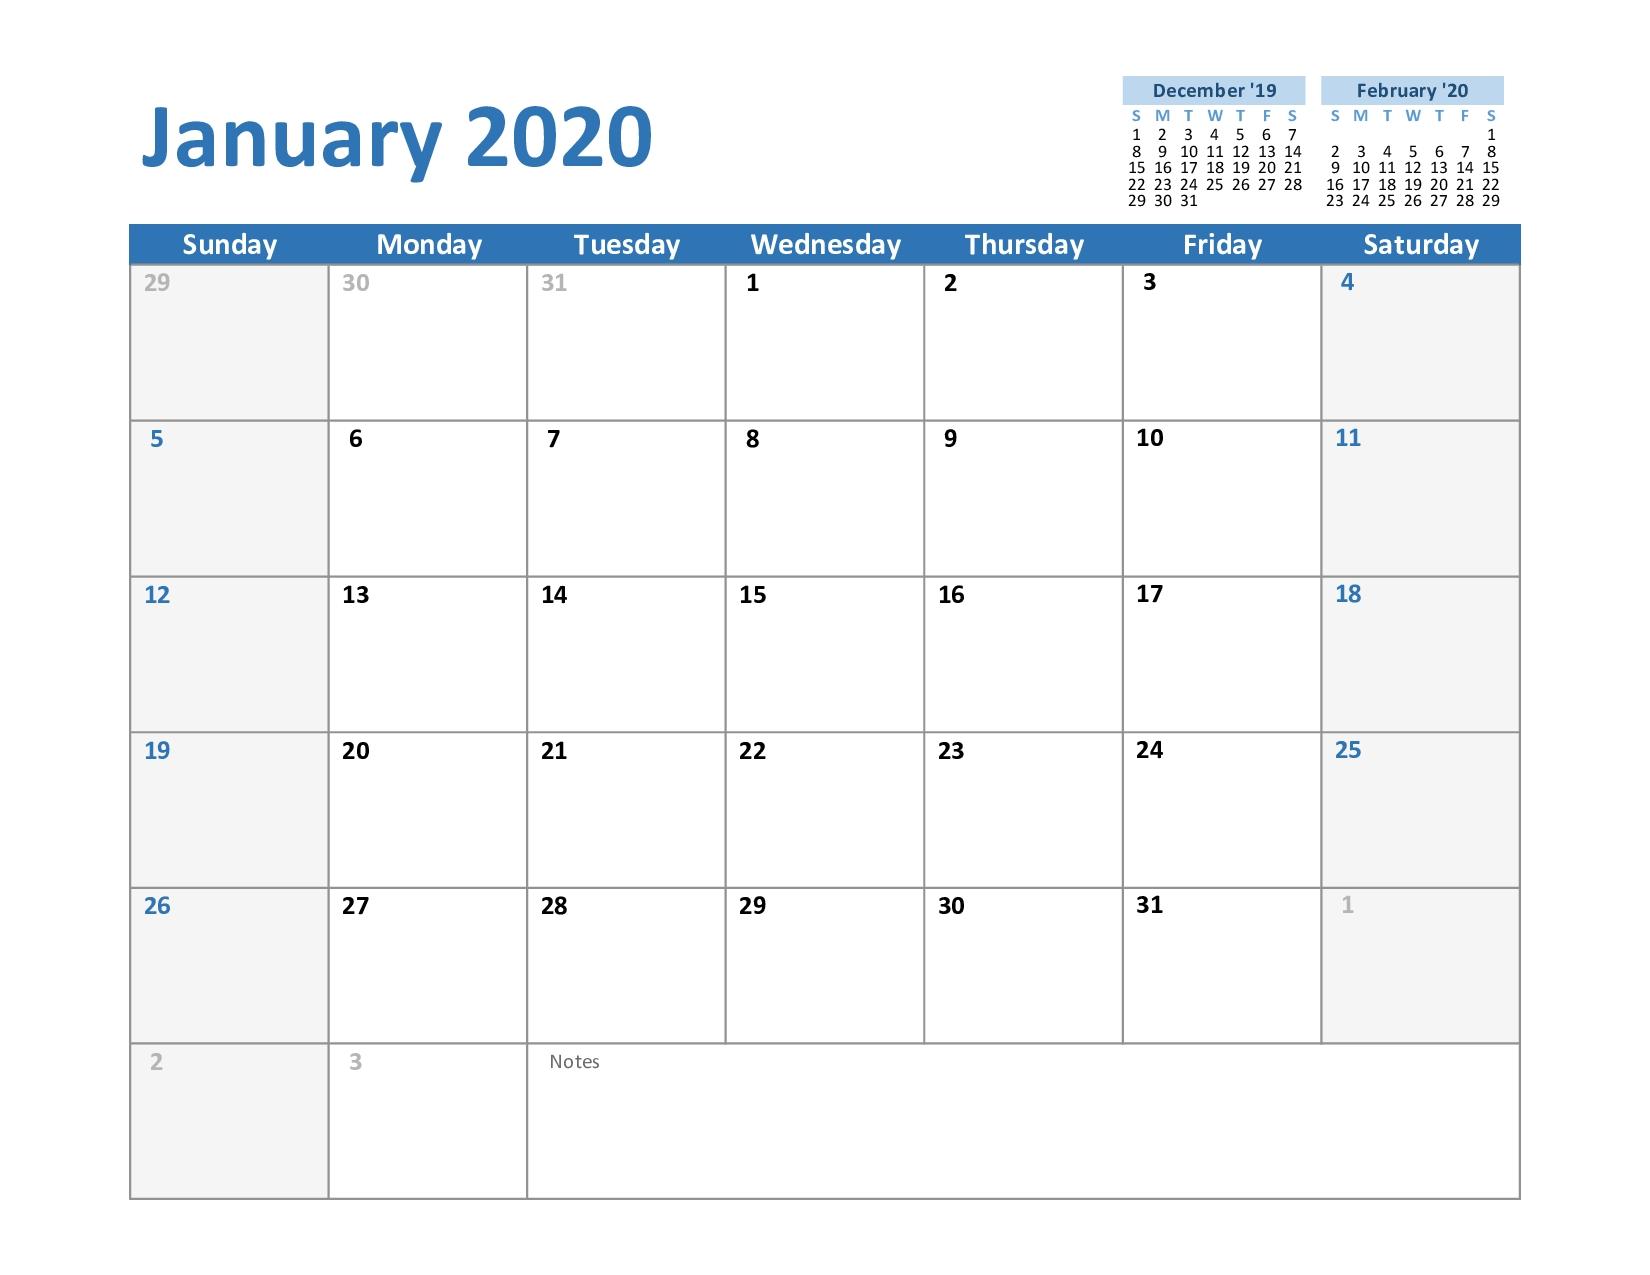 Free 2020 Word Calendar - Wpa.wpart.co-Microsoft Word Template 2020 Calendar